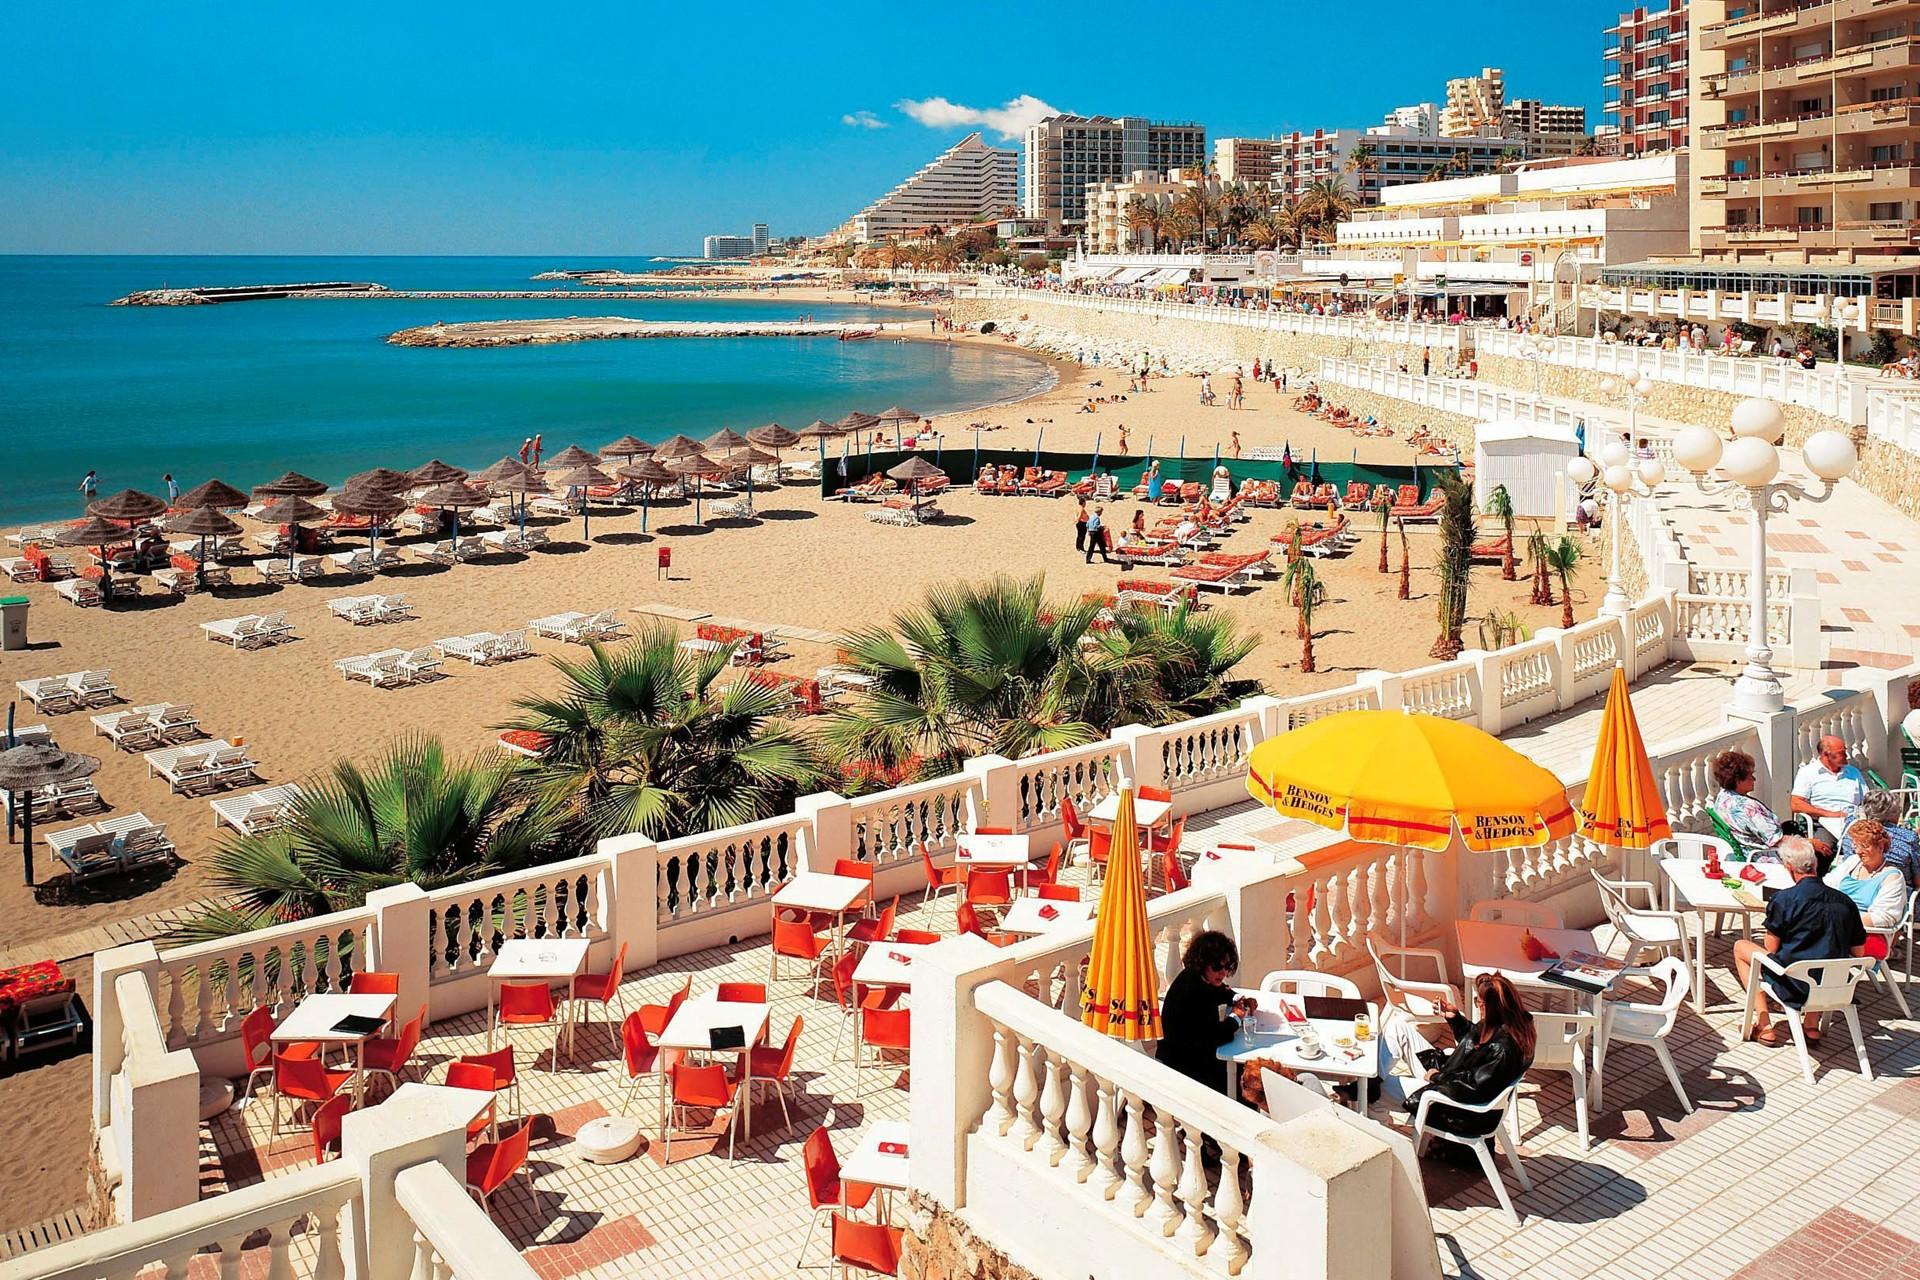 Agence de rencontres Costa del sol gratuit sans enregistrement datant